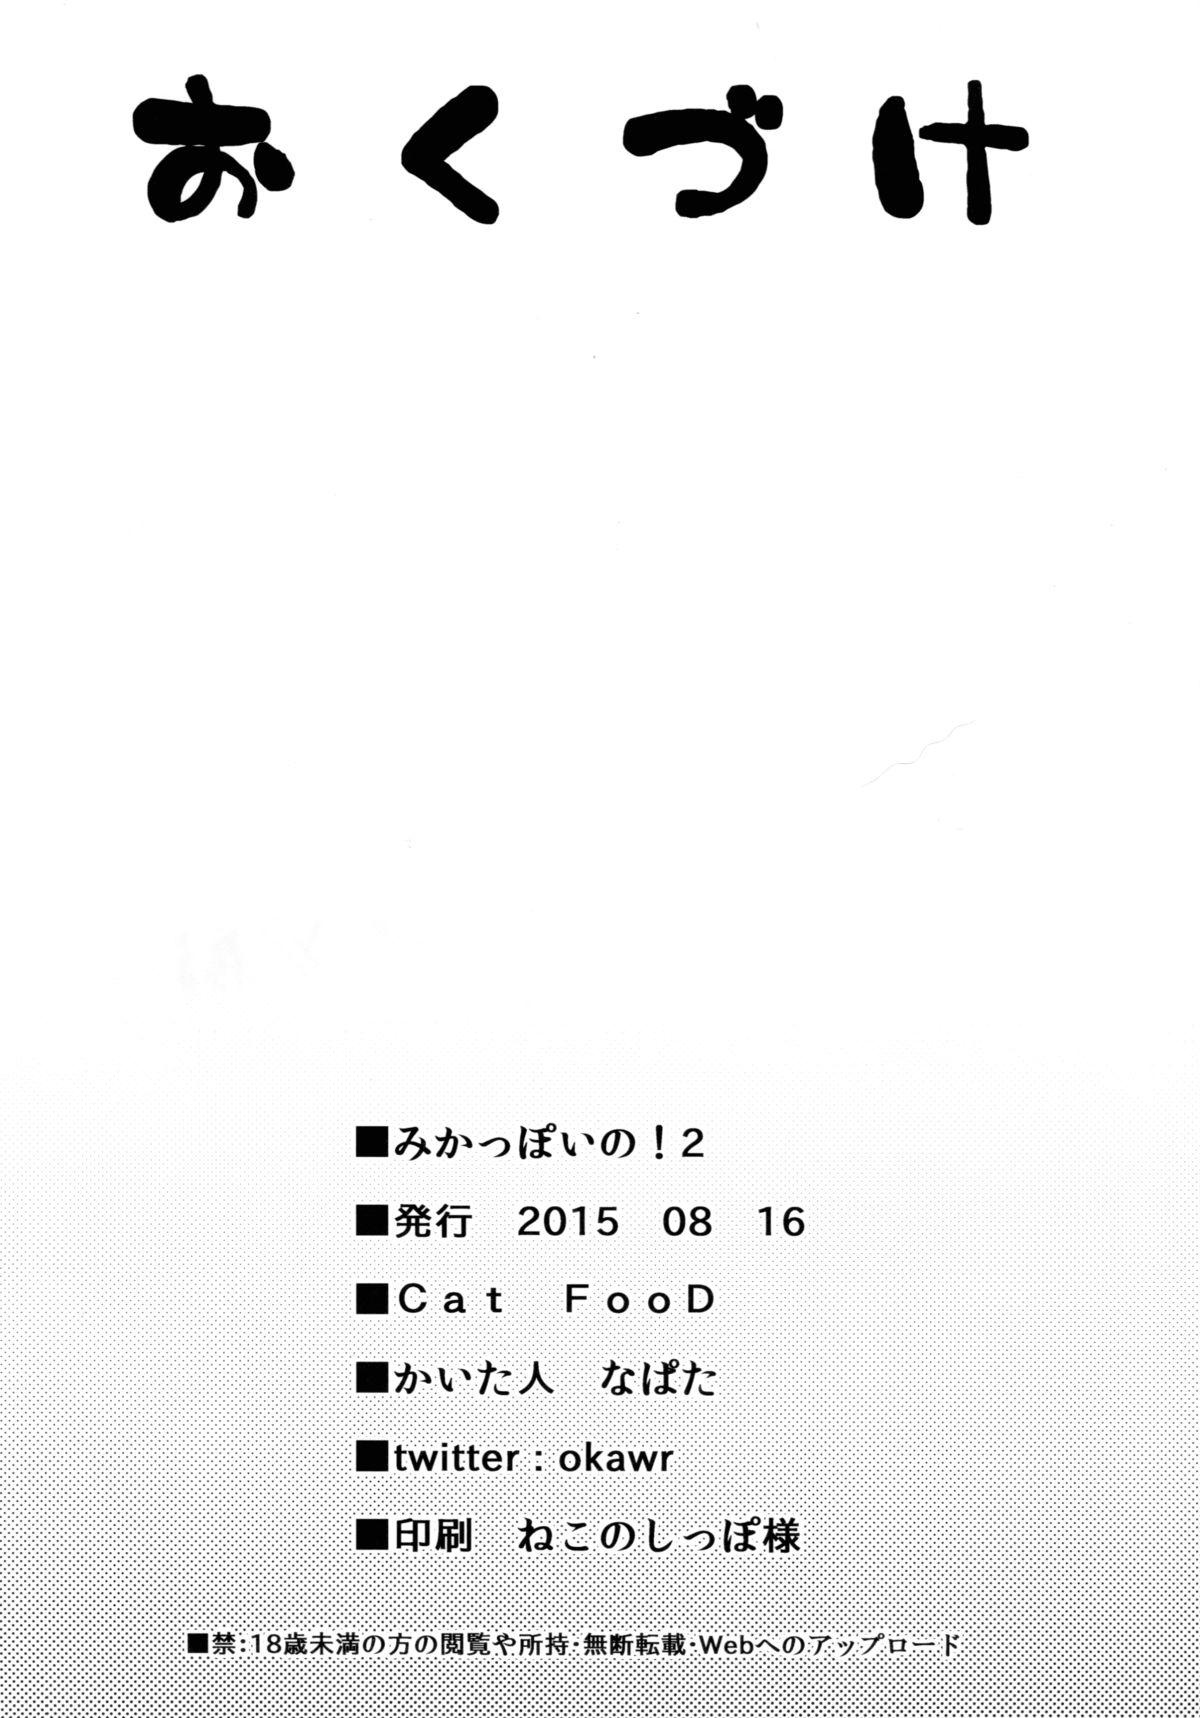 Mika-ppoi no! 2 16